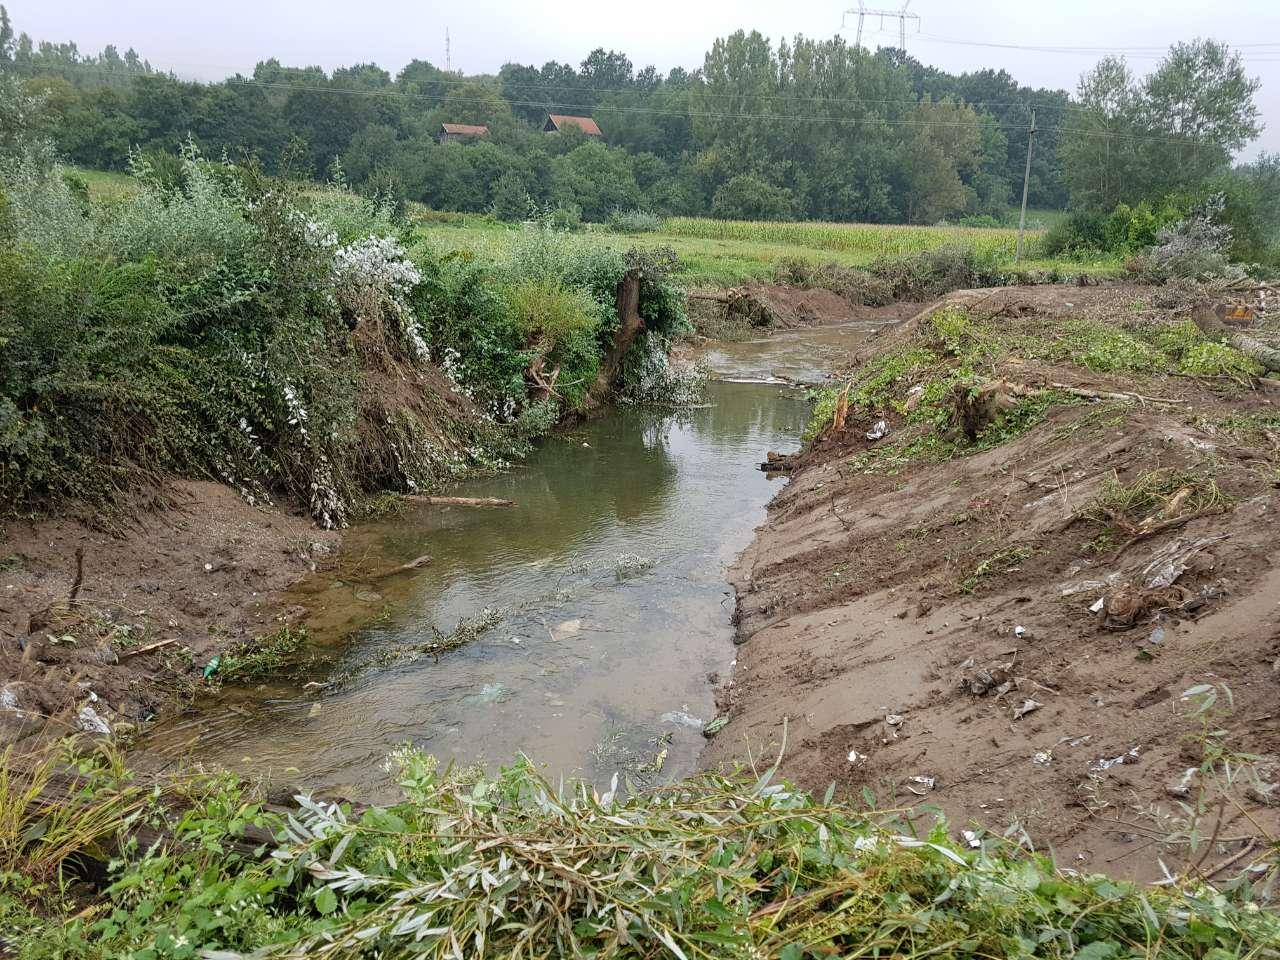 Čišćenje korita reke Svrljiški Timok